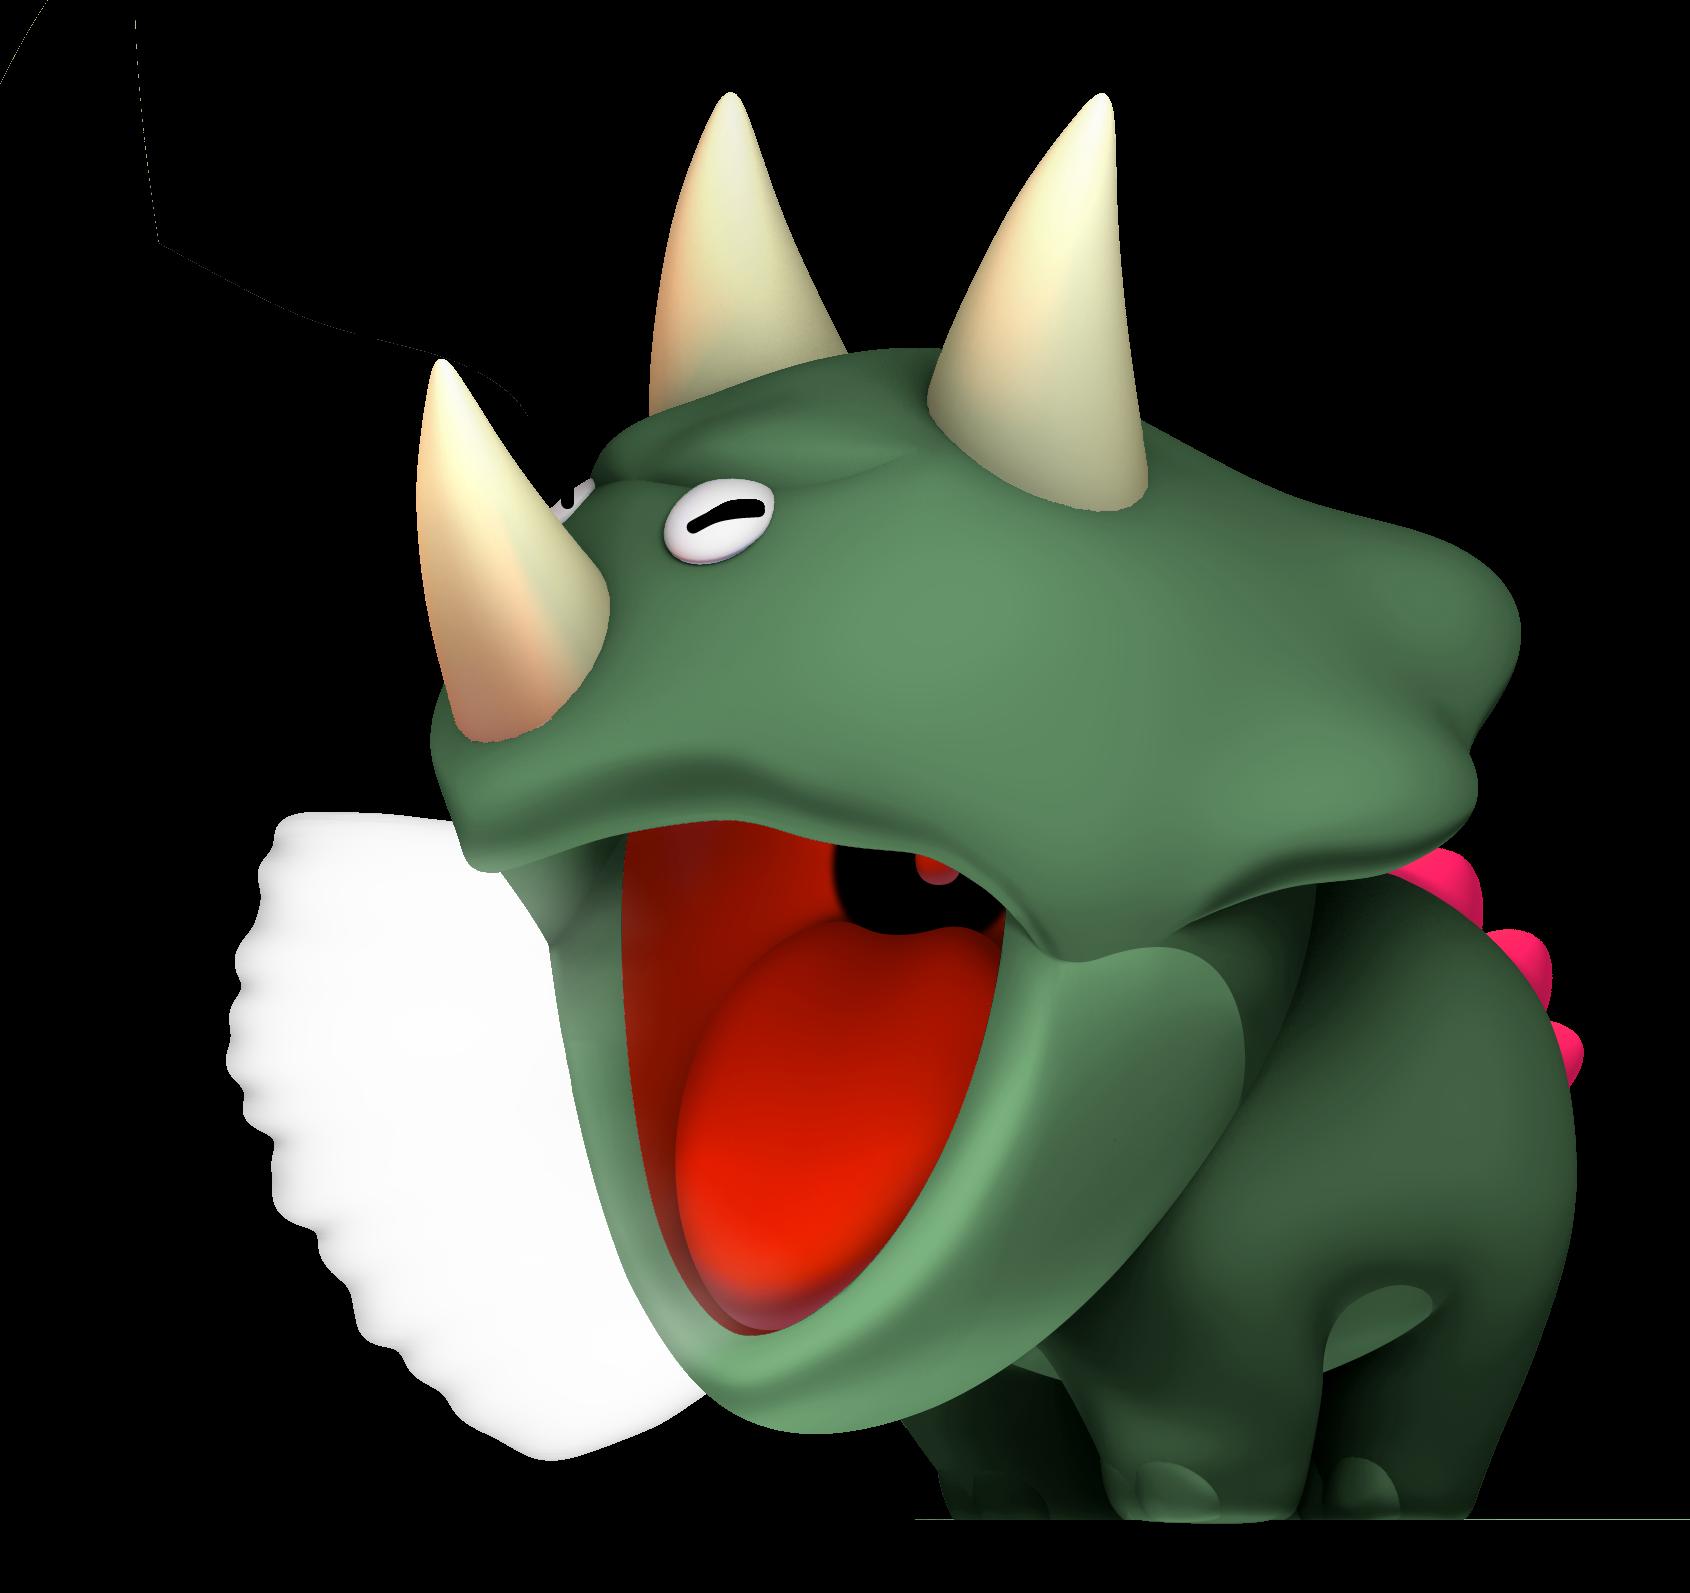 Dino rhino fantendo nintendo. Torch clipart ancient